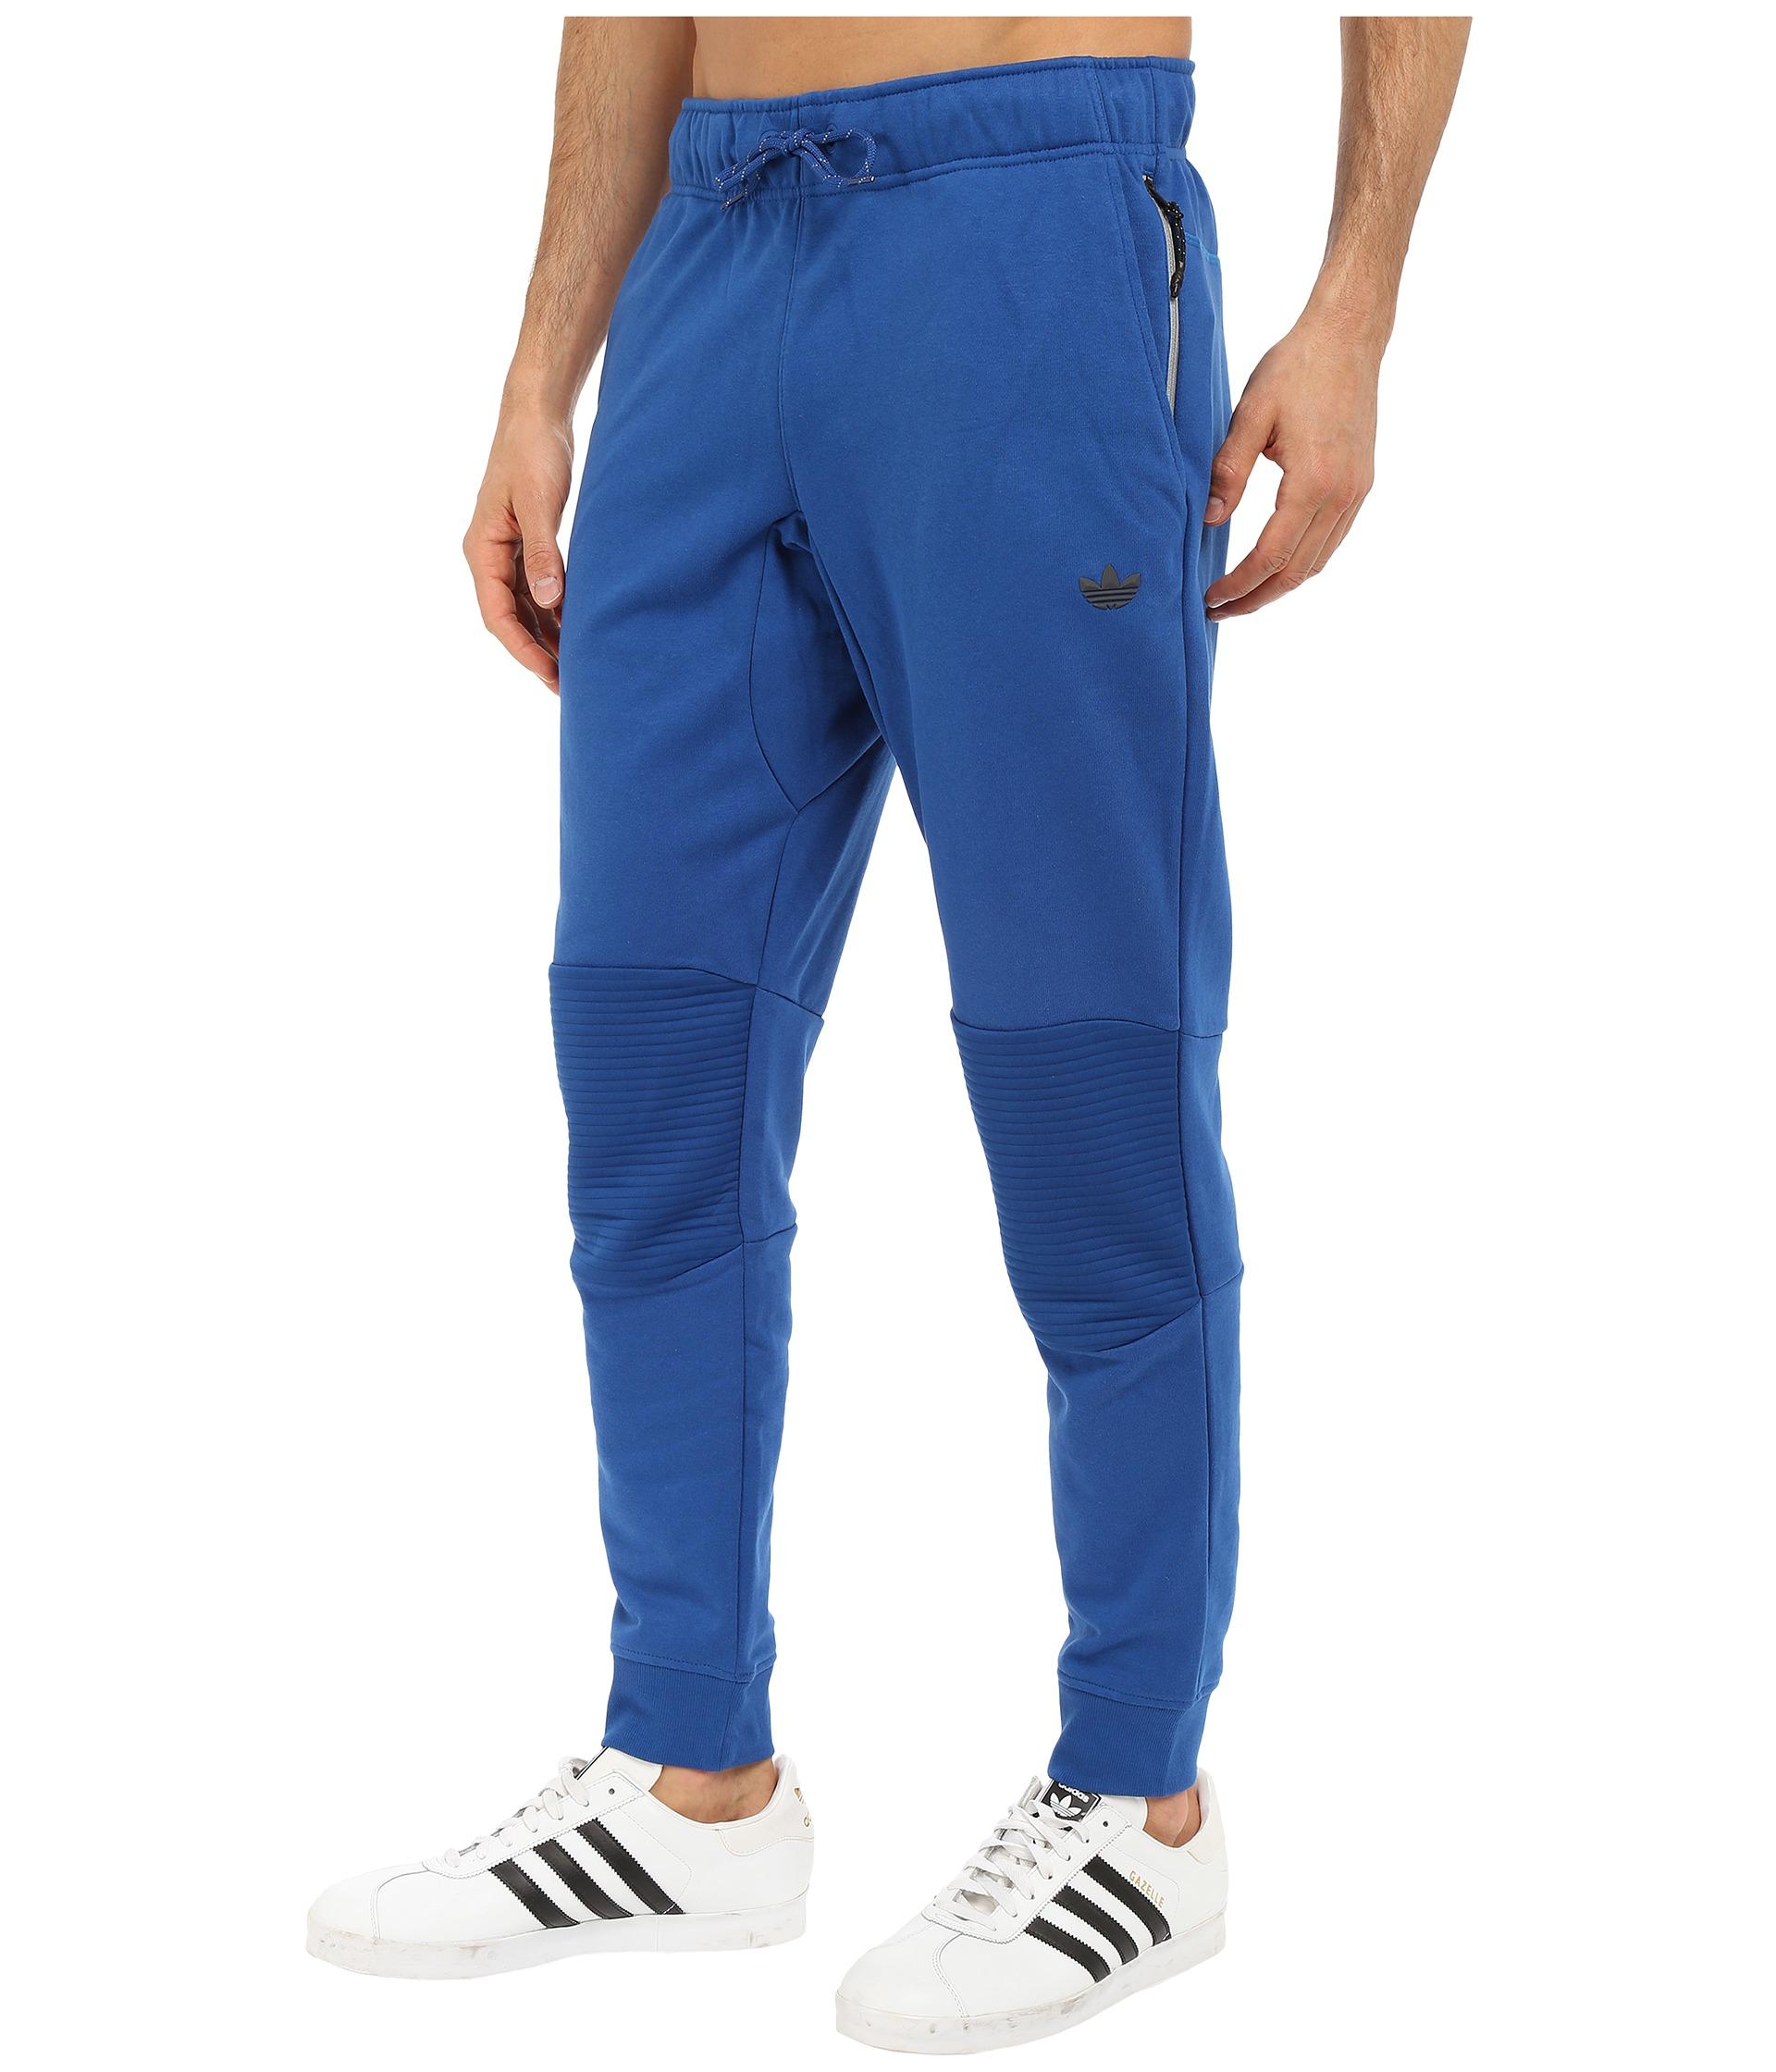 Popular Adidas Women39s Night Jogger ThreeQuarter Track Pants  Adidas UK